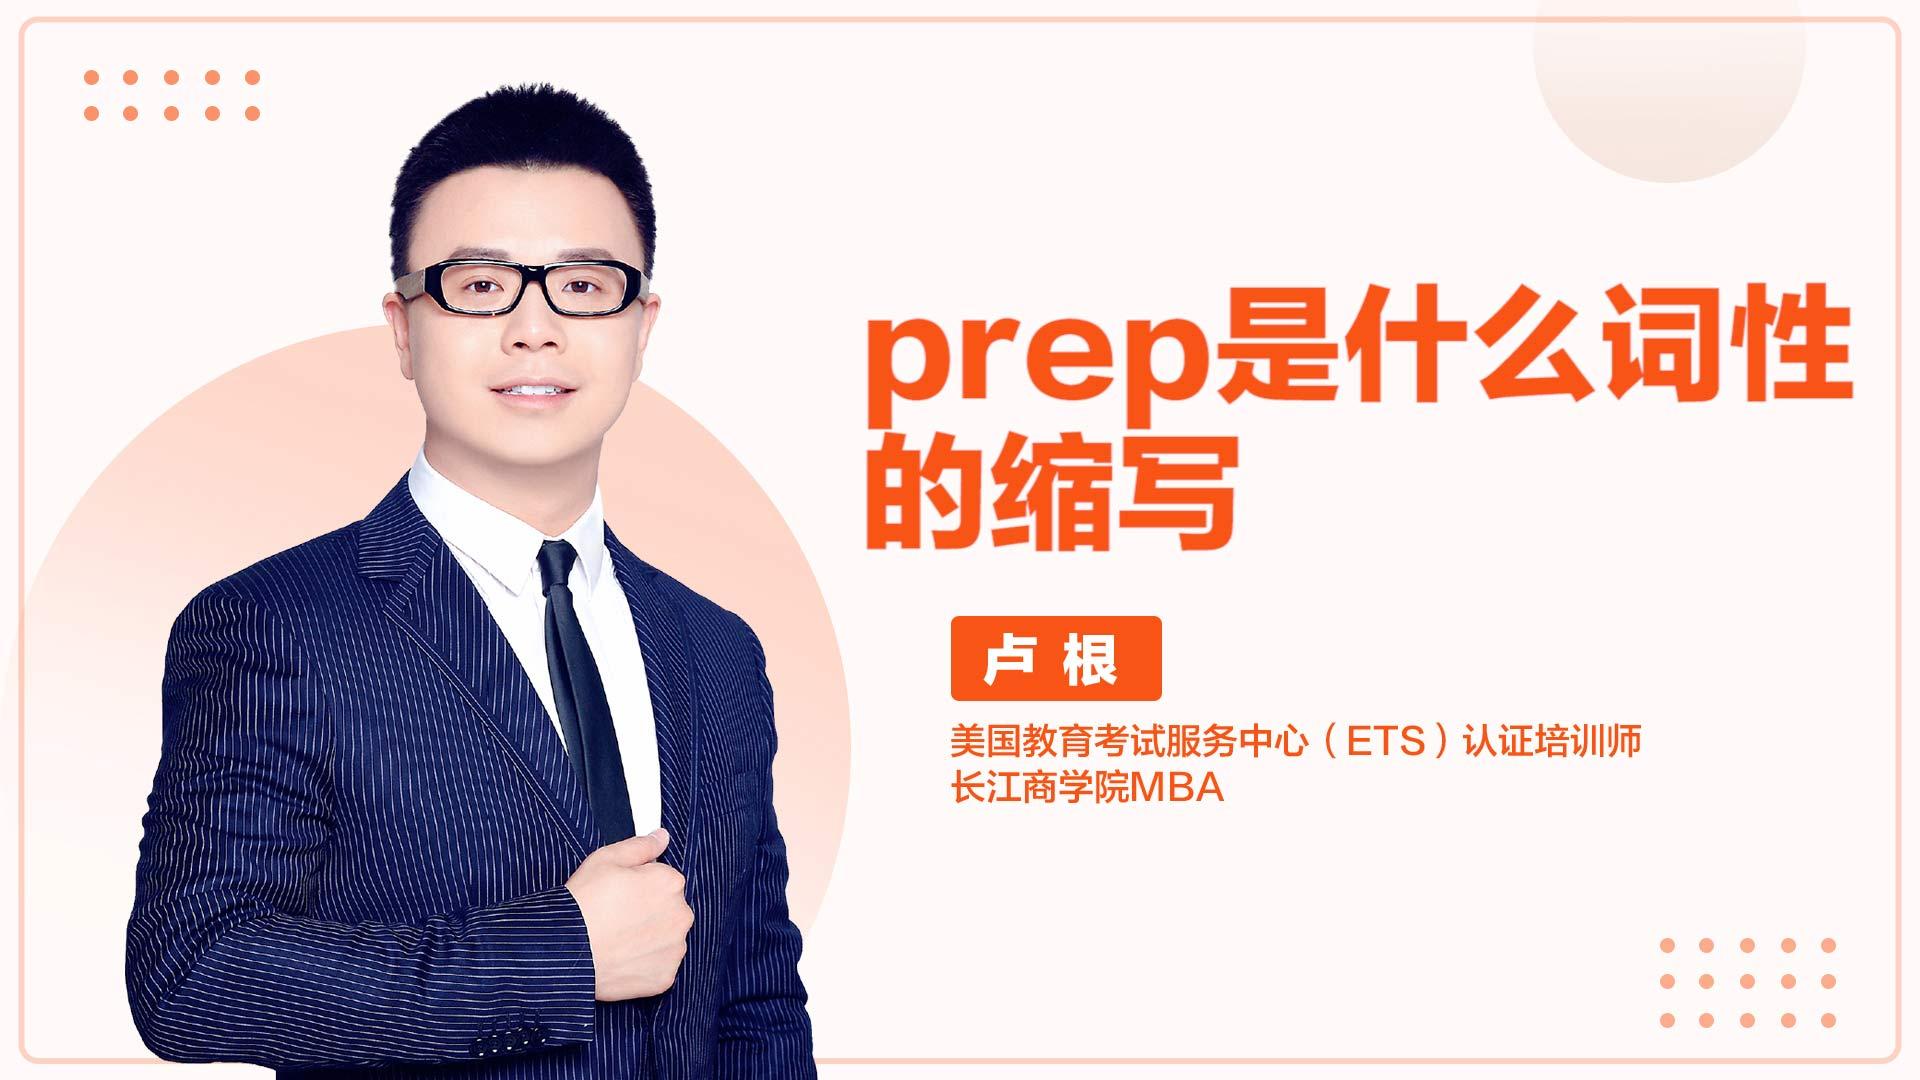 prep是什么词性的缩写